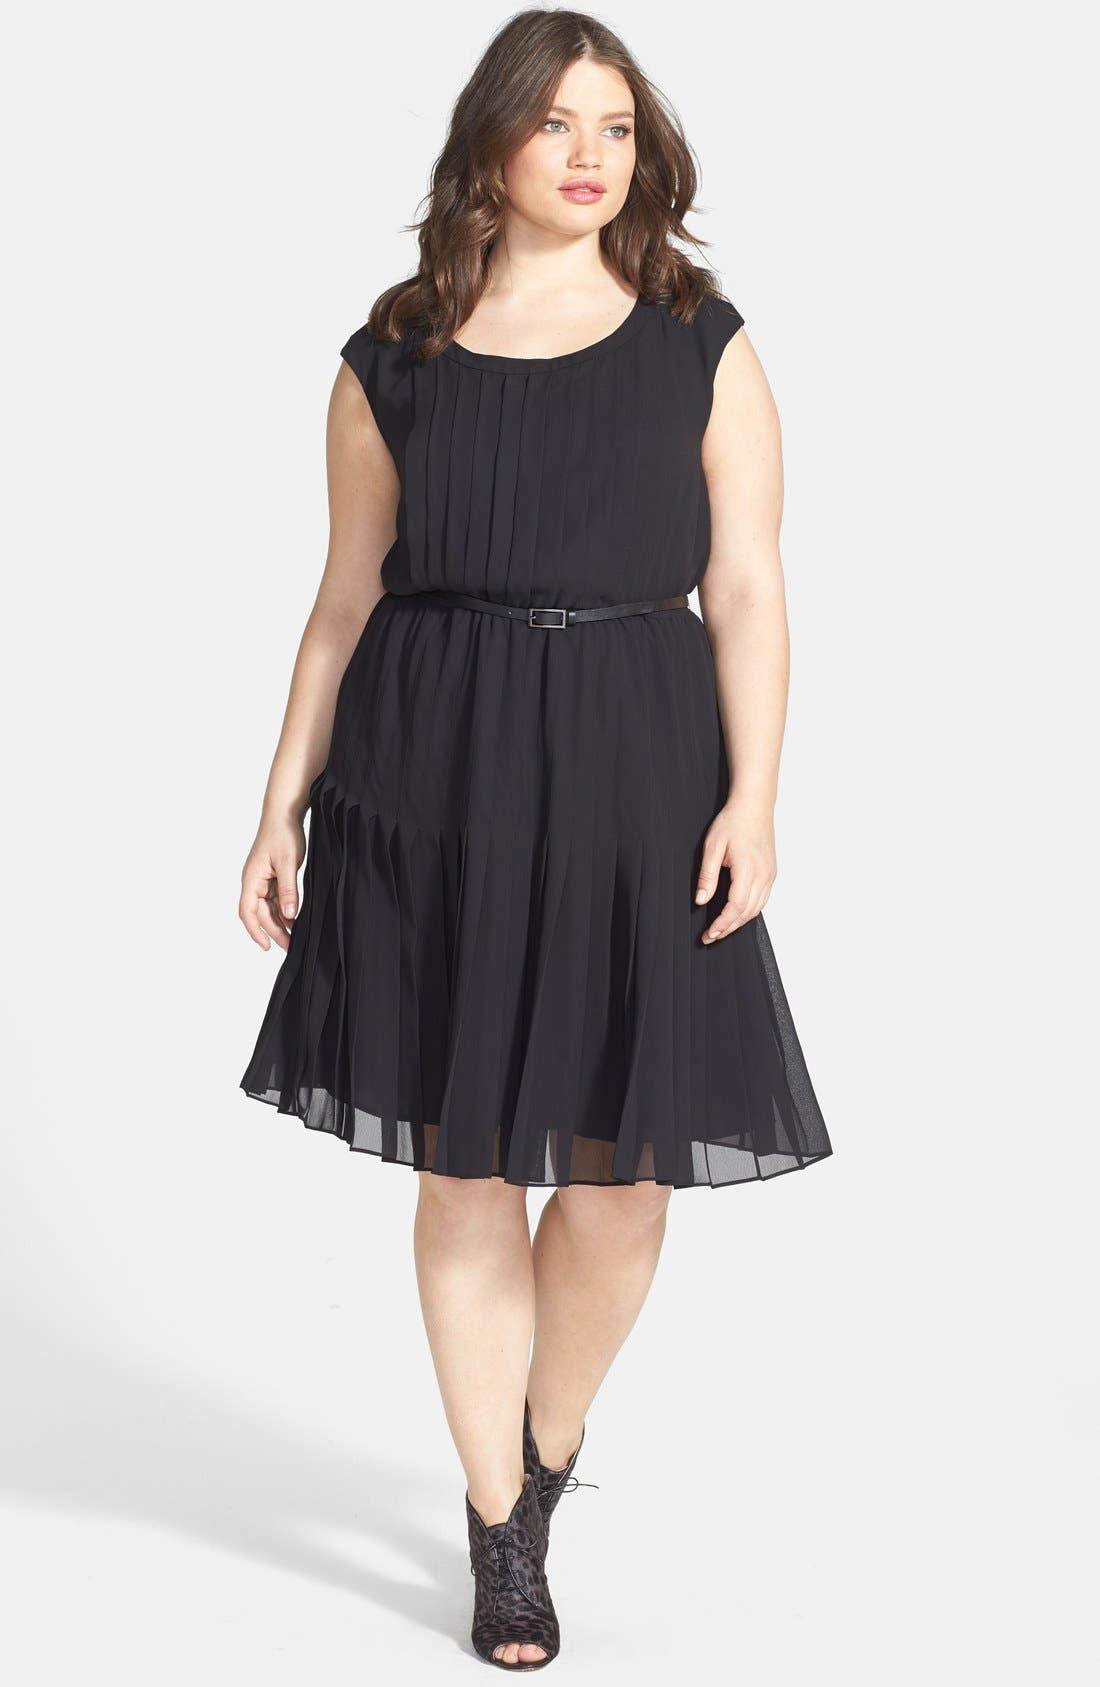 Alternate Image 1 Selected - Halogen® Belted Pleat Dress (Plus Size) (Online Only)